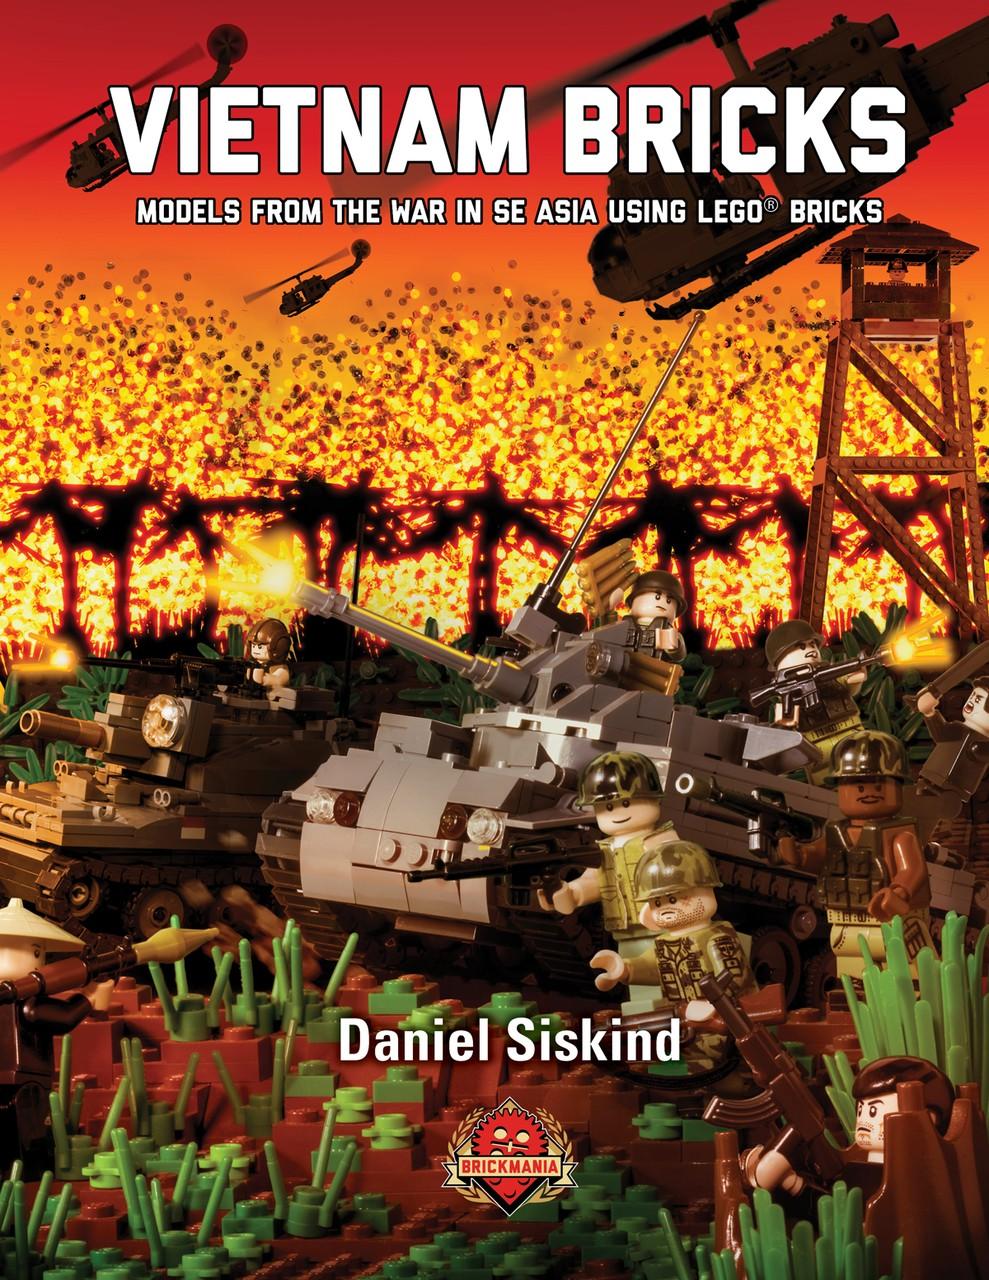 vietnam bricks  building instructions for models from the war in se asia using lego u00ae bricks